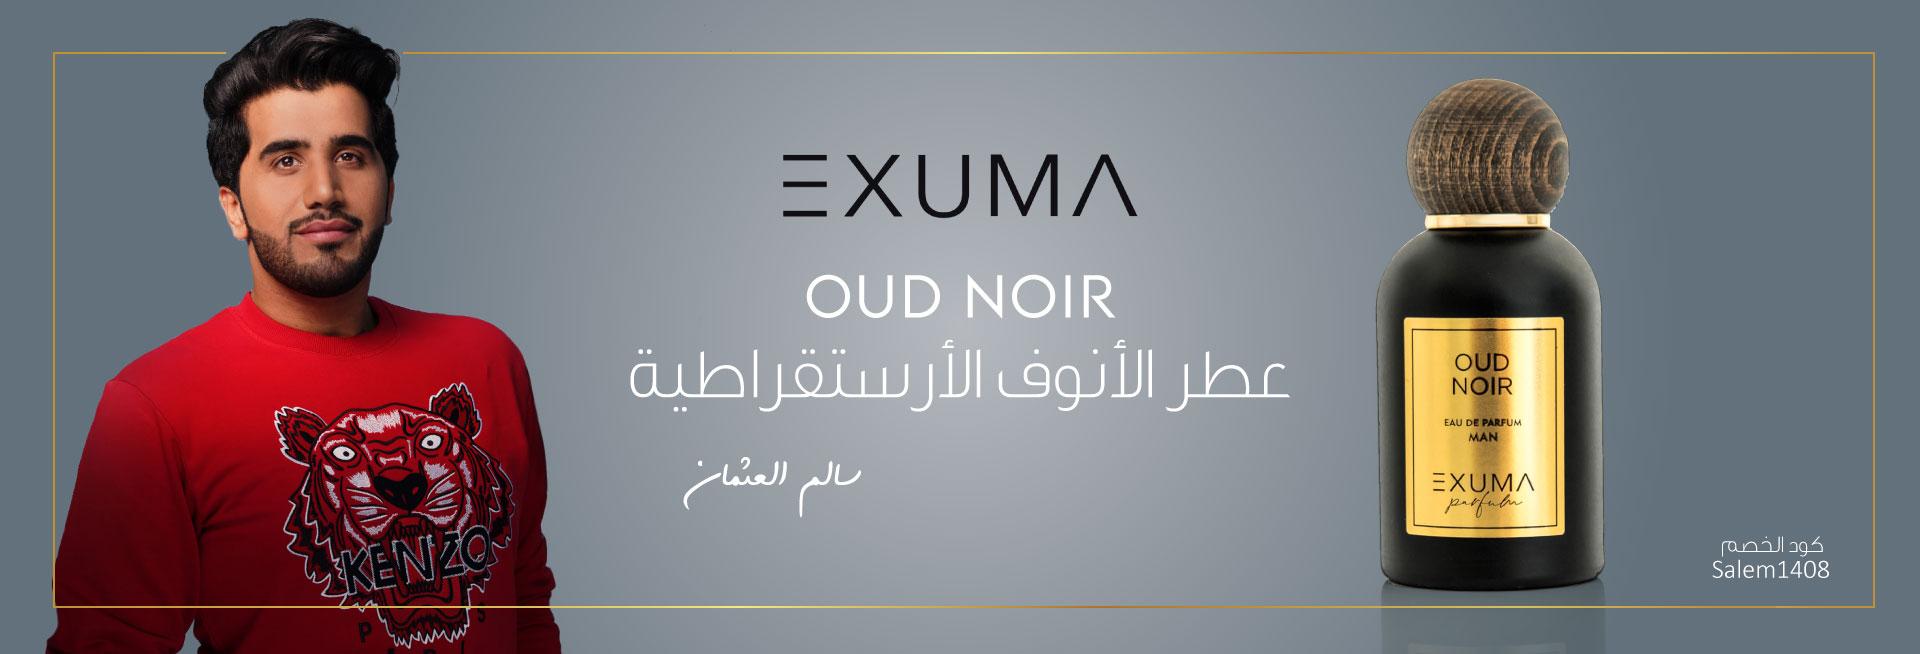 Salem Al Othman 1